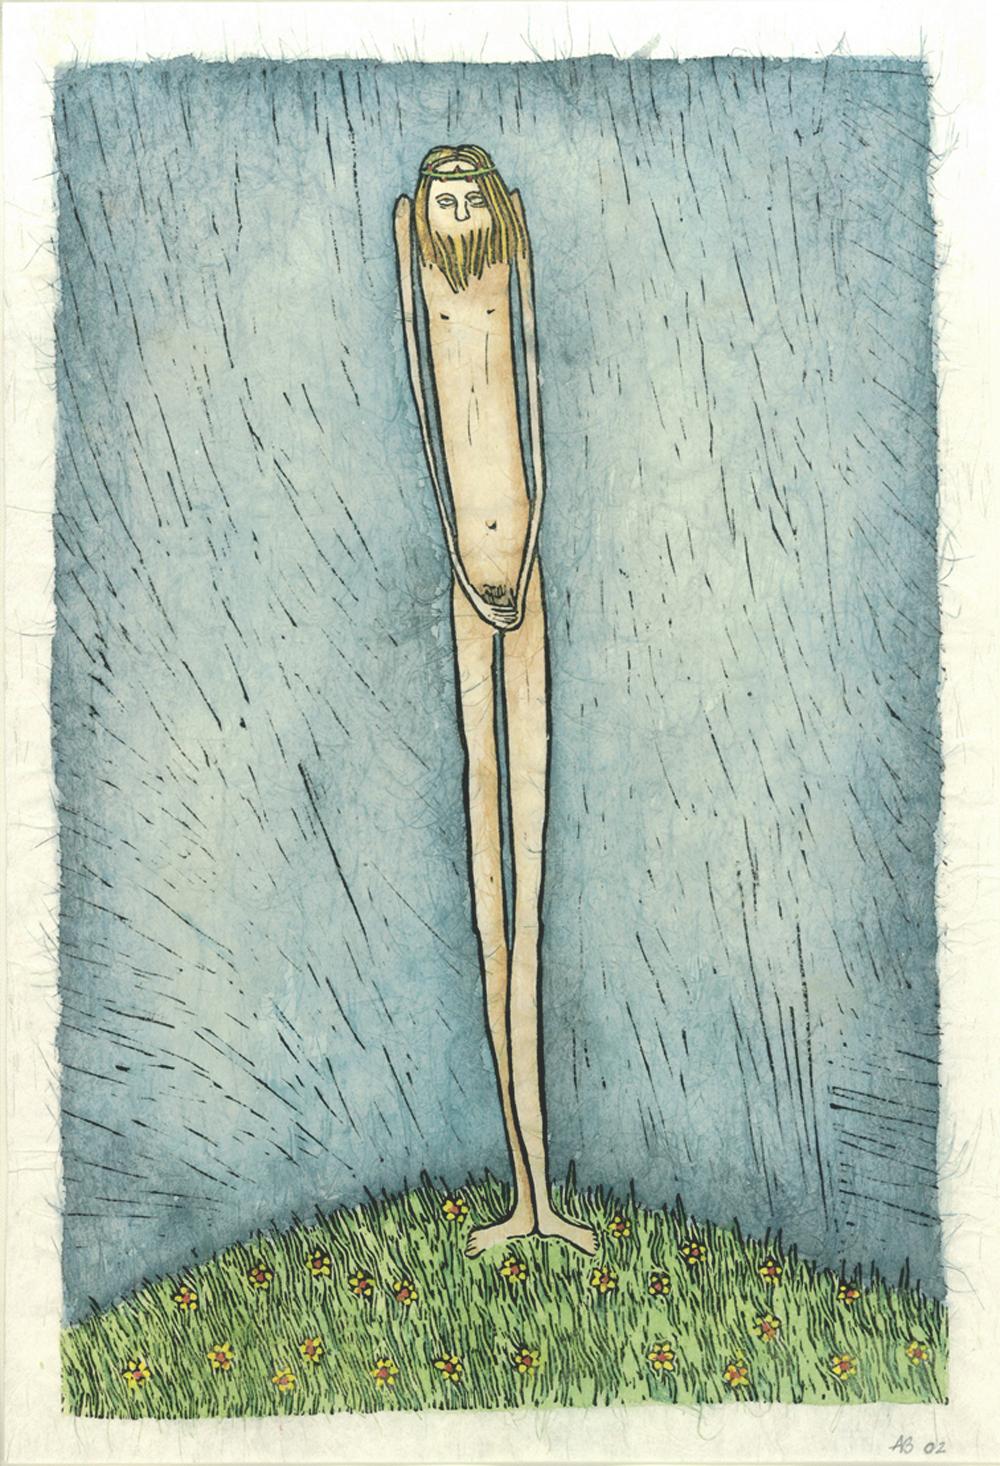 ...en de boom bloeit X kruisweg, ingekleurde linosnede